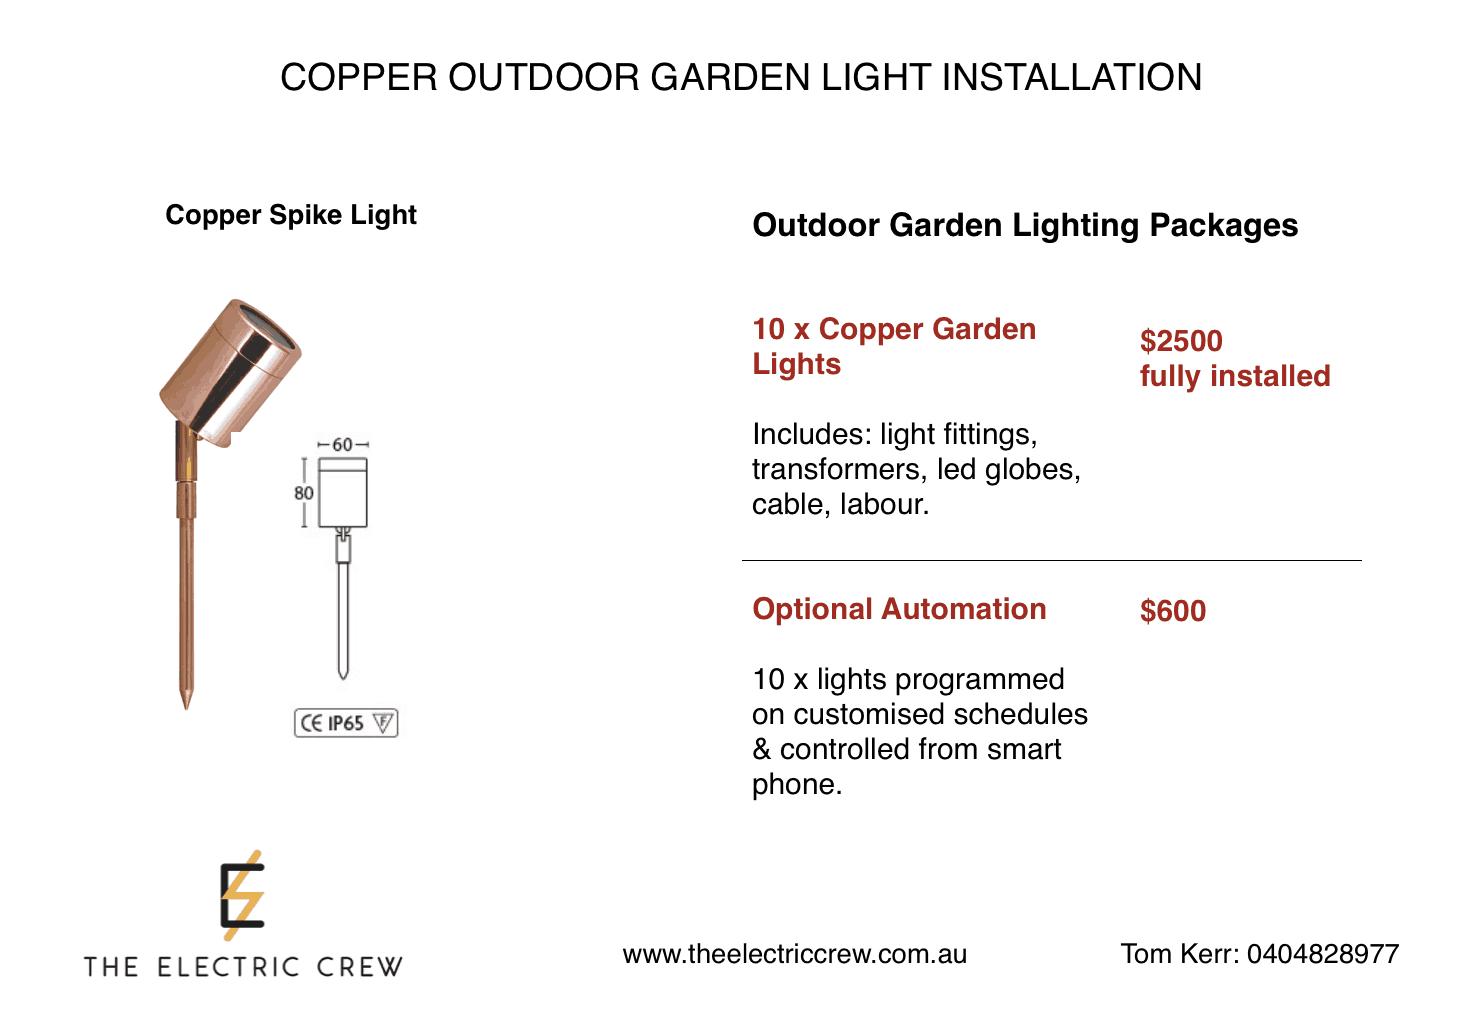 Copper Outdoor Garden Light Installation Package